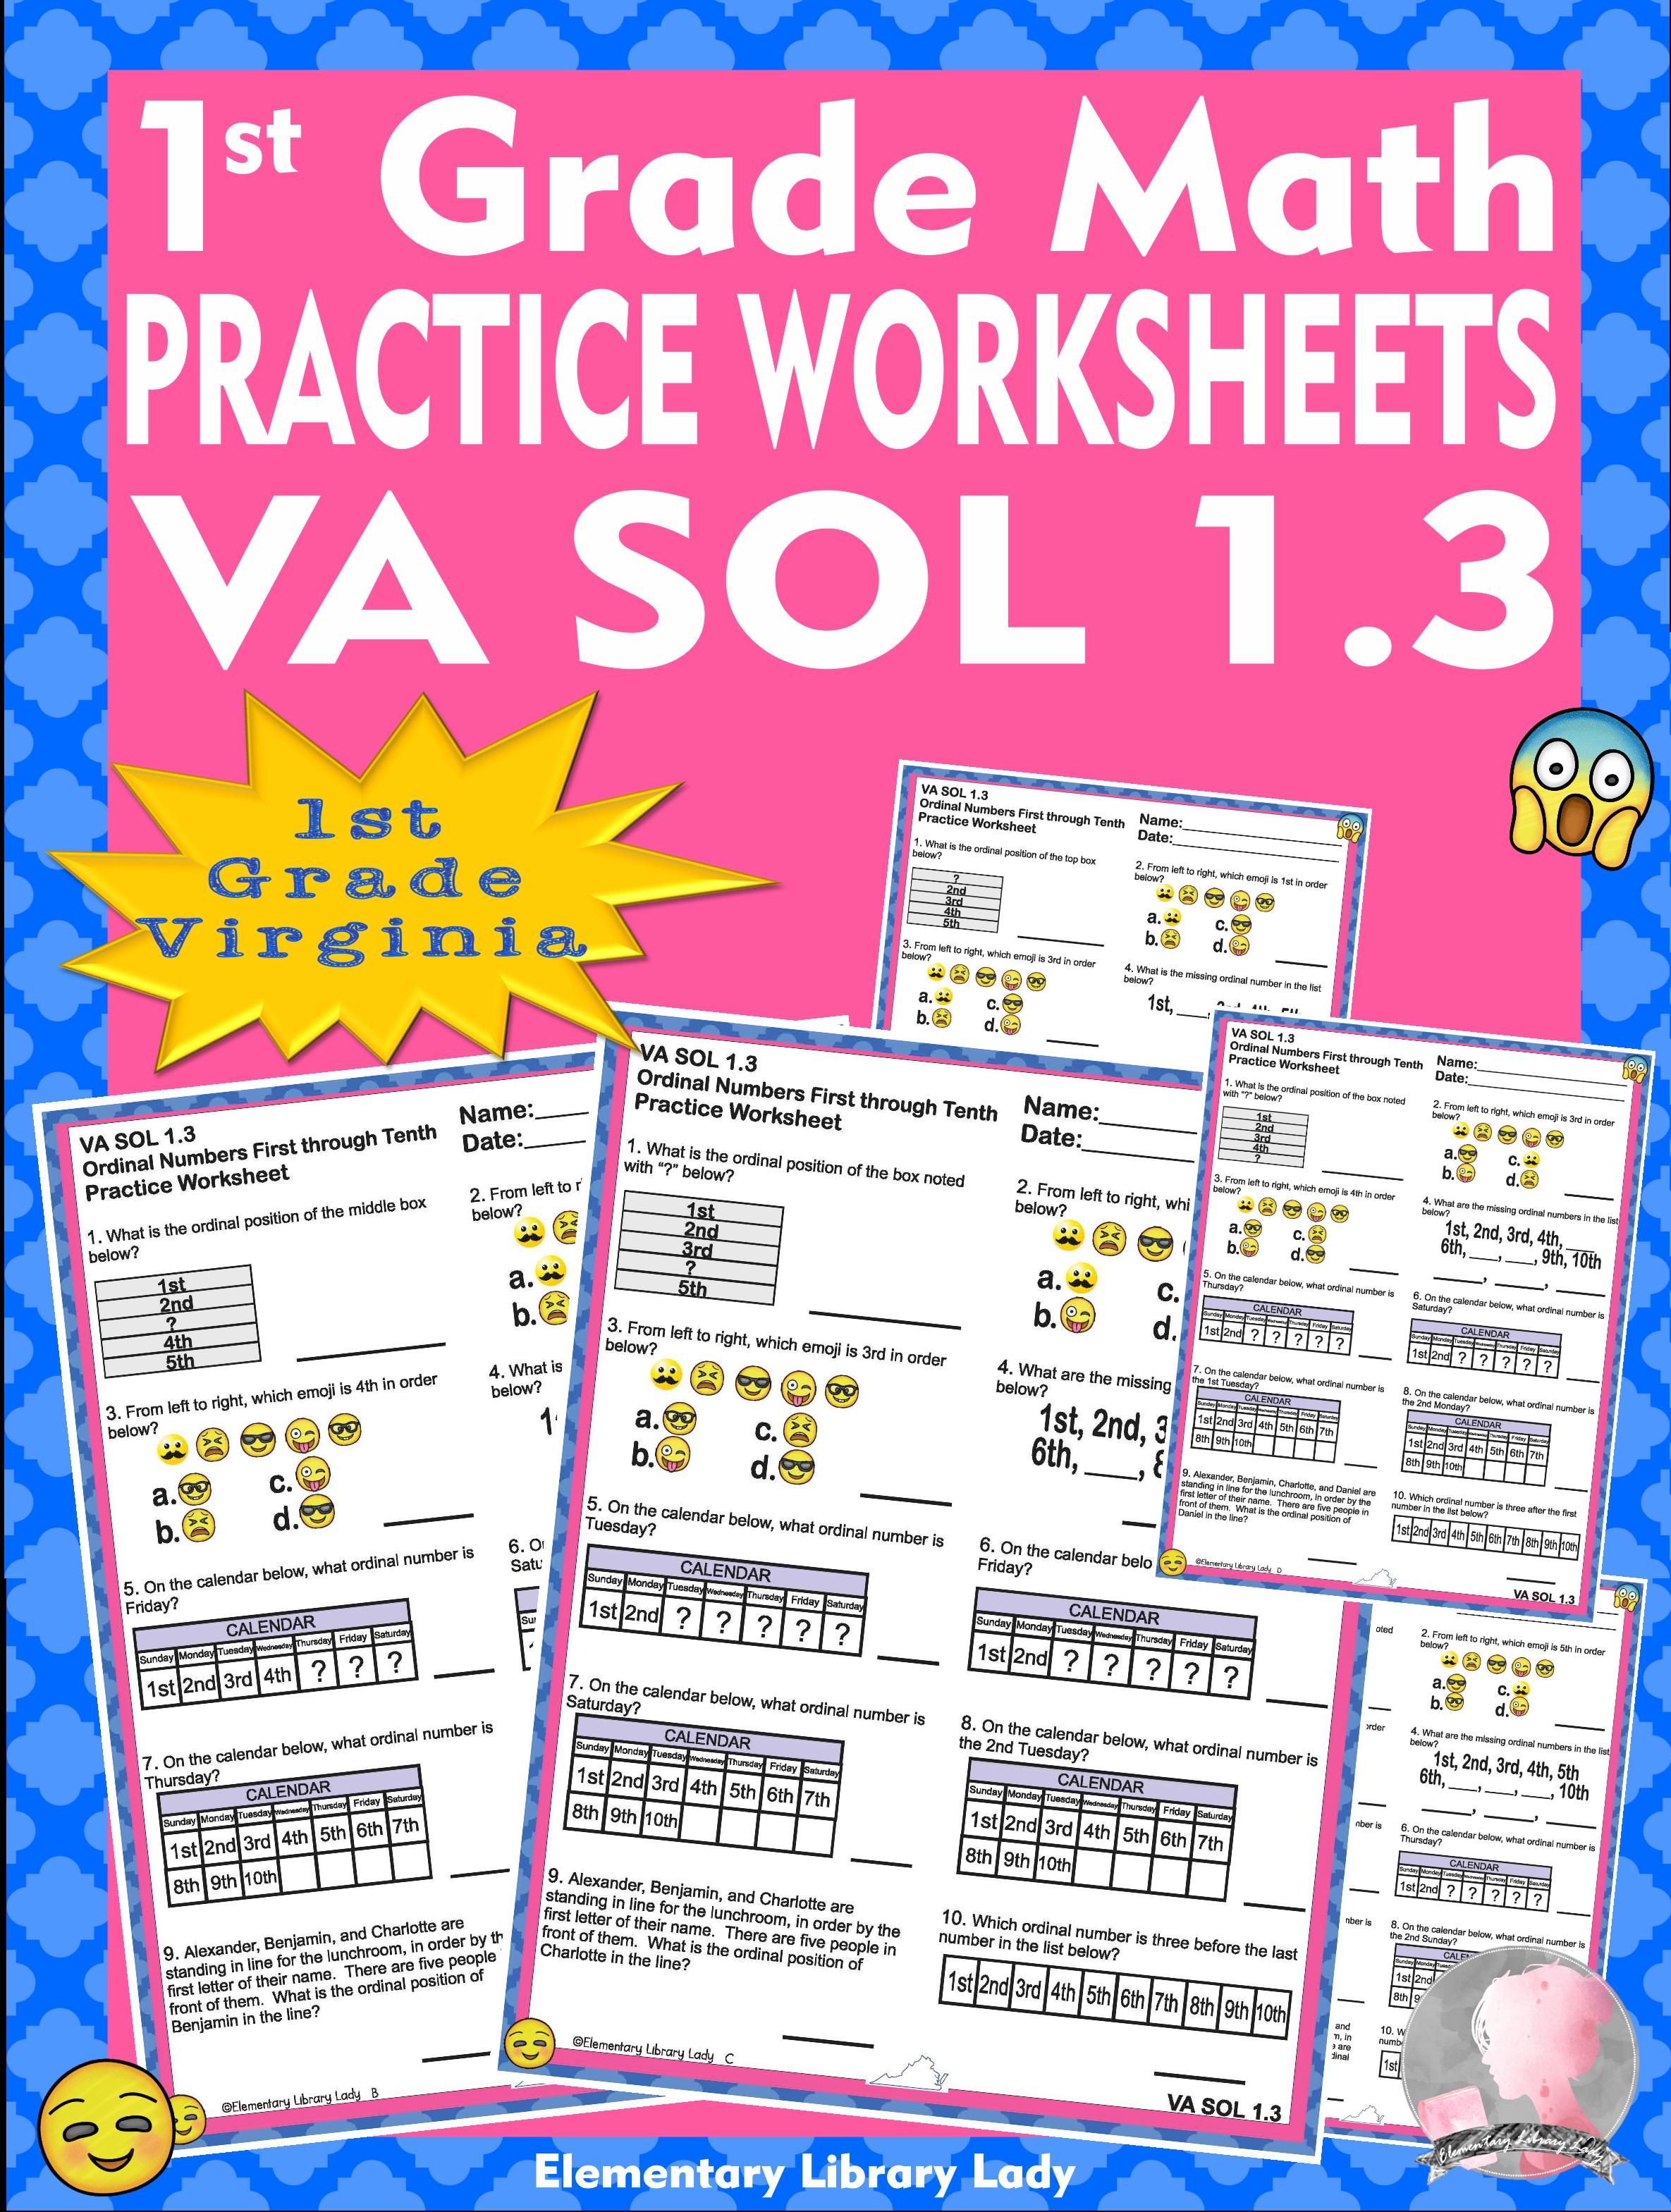 Math Va Sol 1 3 Virginia 1st Grade Practice Worksheets